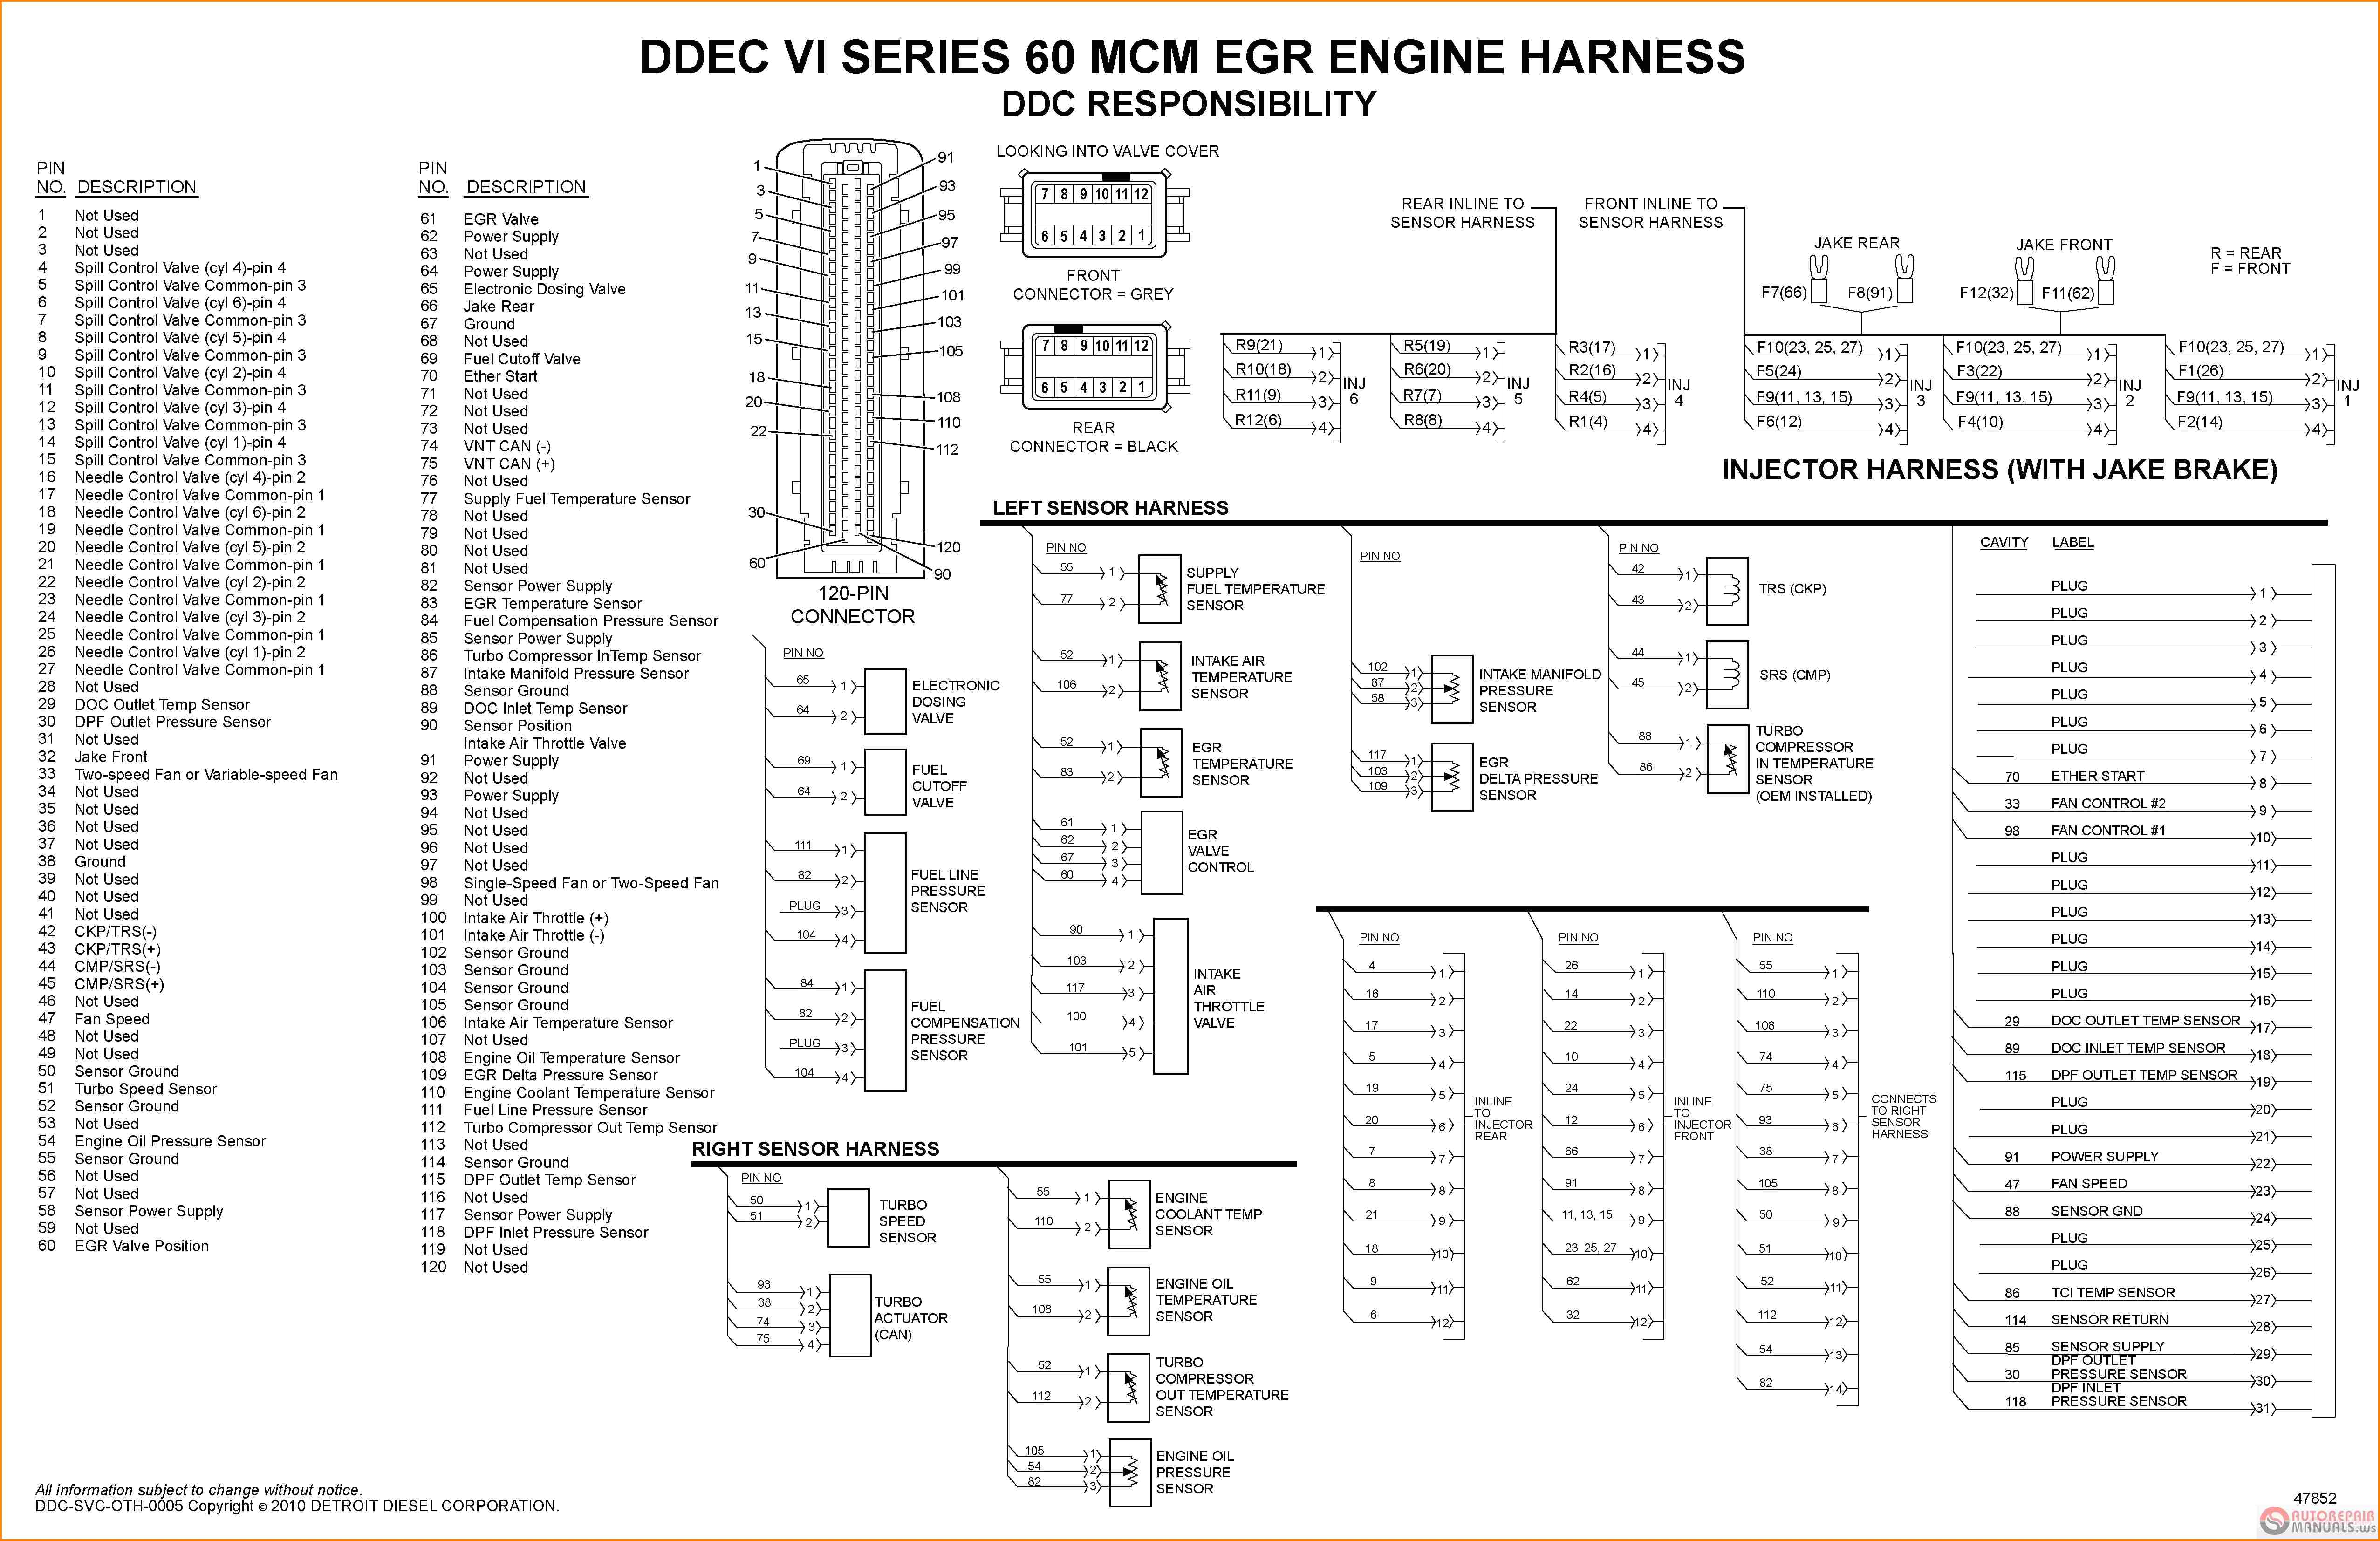 14 ddec 4 ecm wiring diagram car cable and detroit diesel series 60 on detroit diesel series 60 ecm wiring jpg